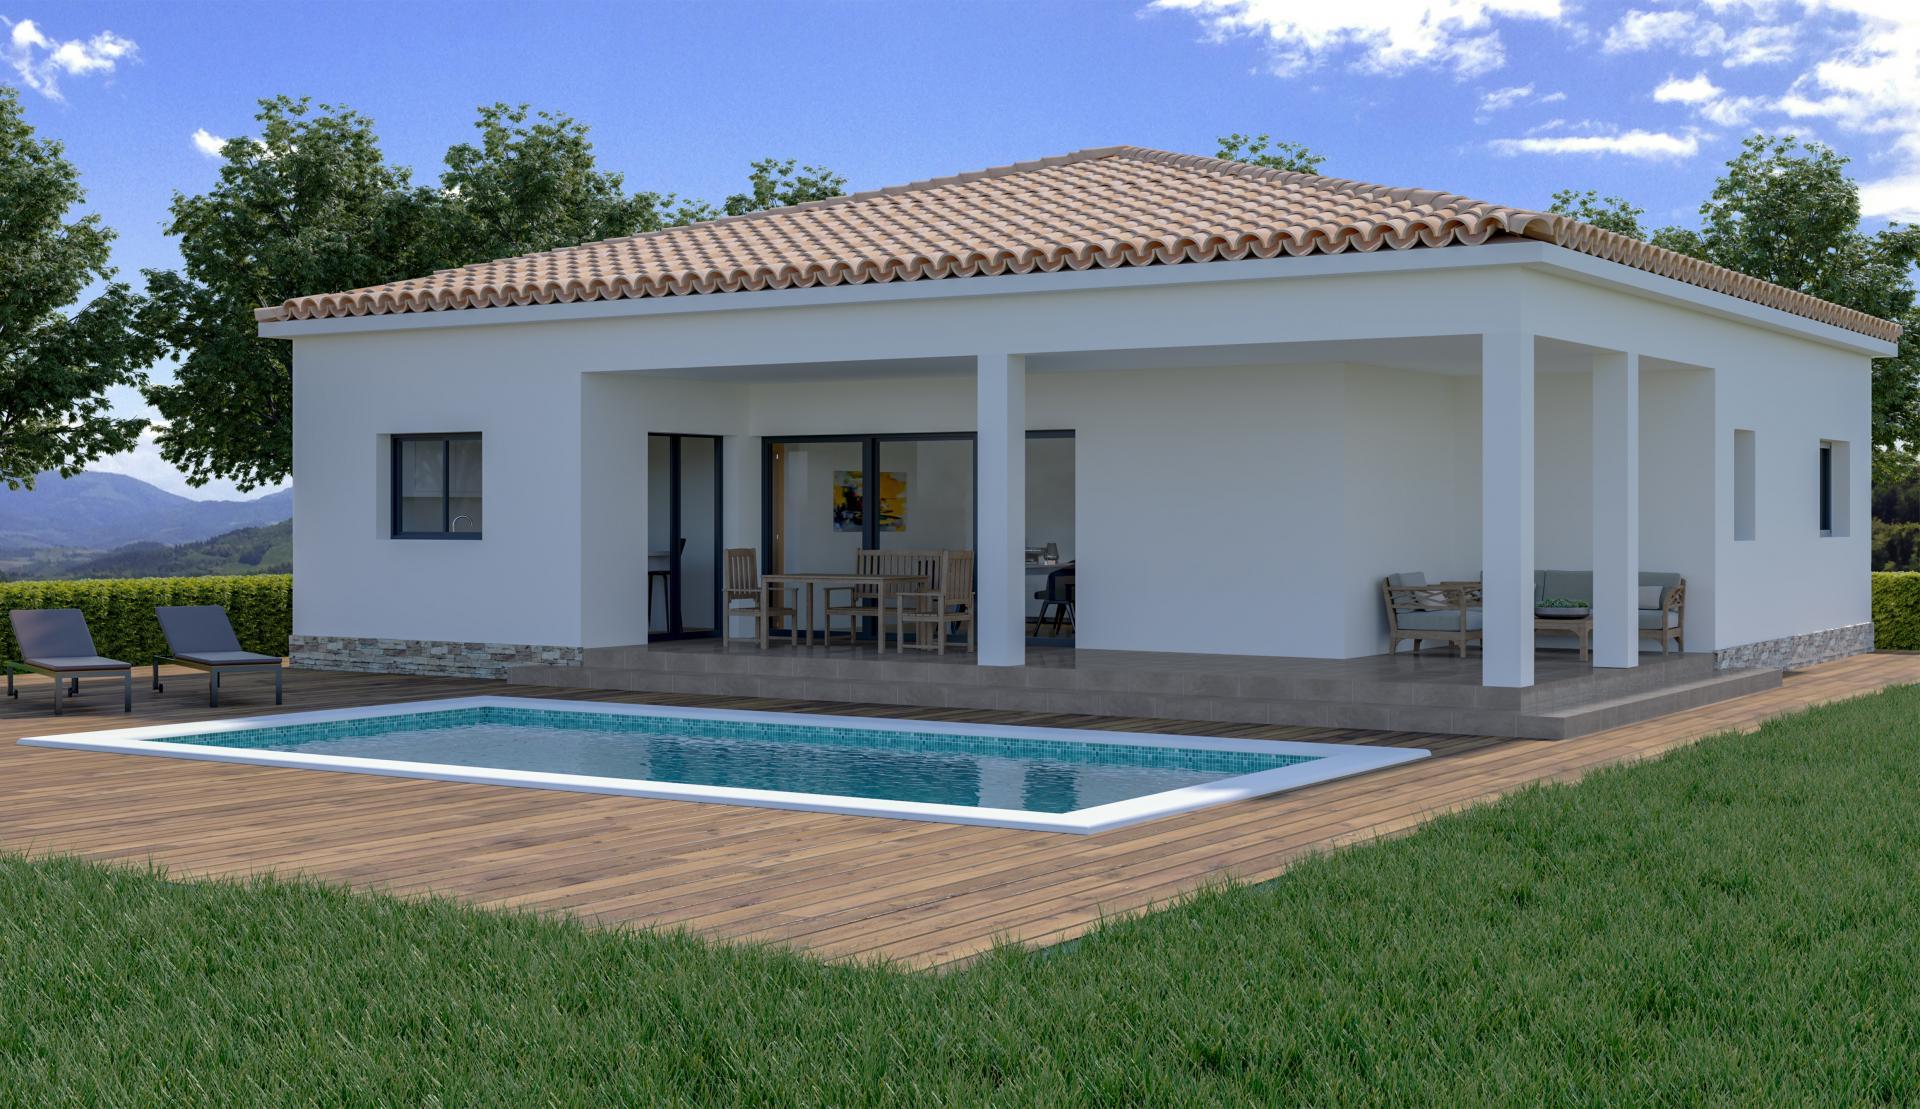 Nieuwe villa op plan te koop in Macisvenda, Murcia in Medvilla Spanje